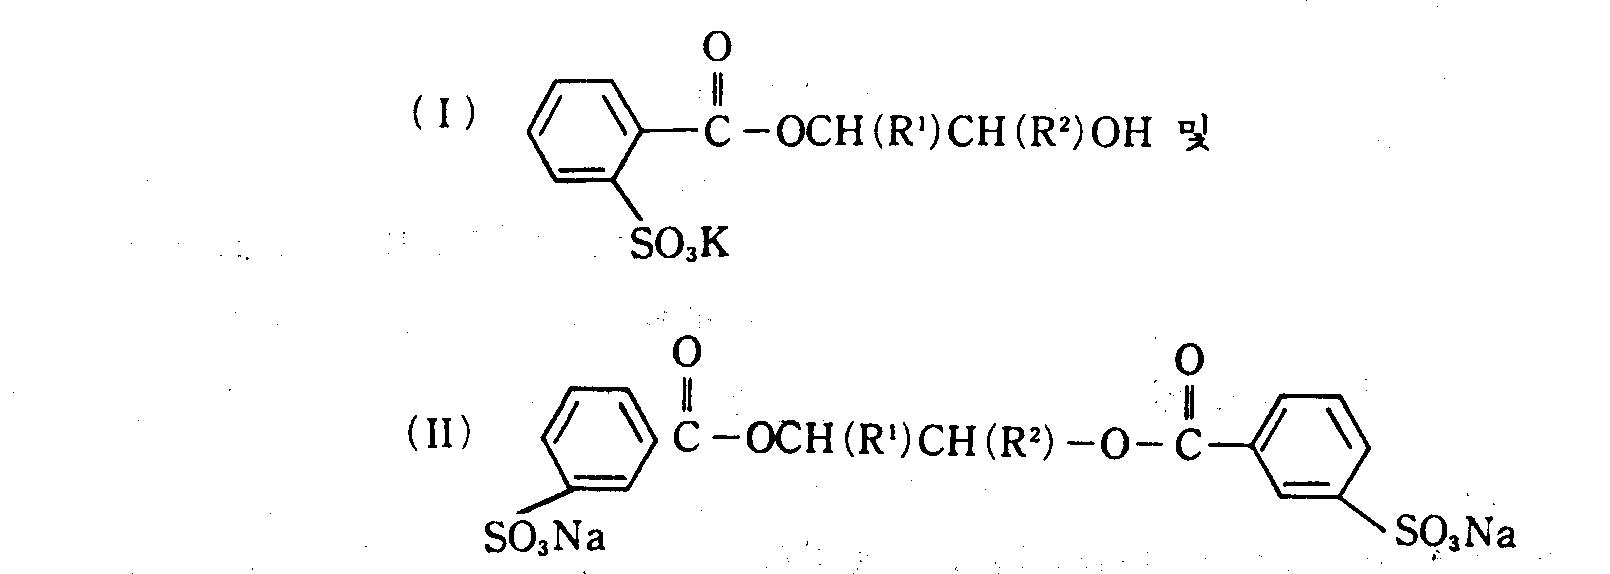 Figure kpo00009